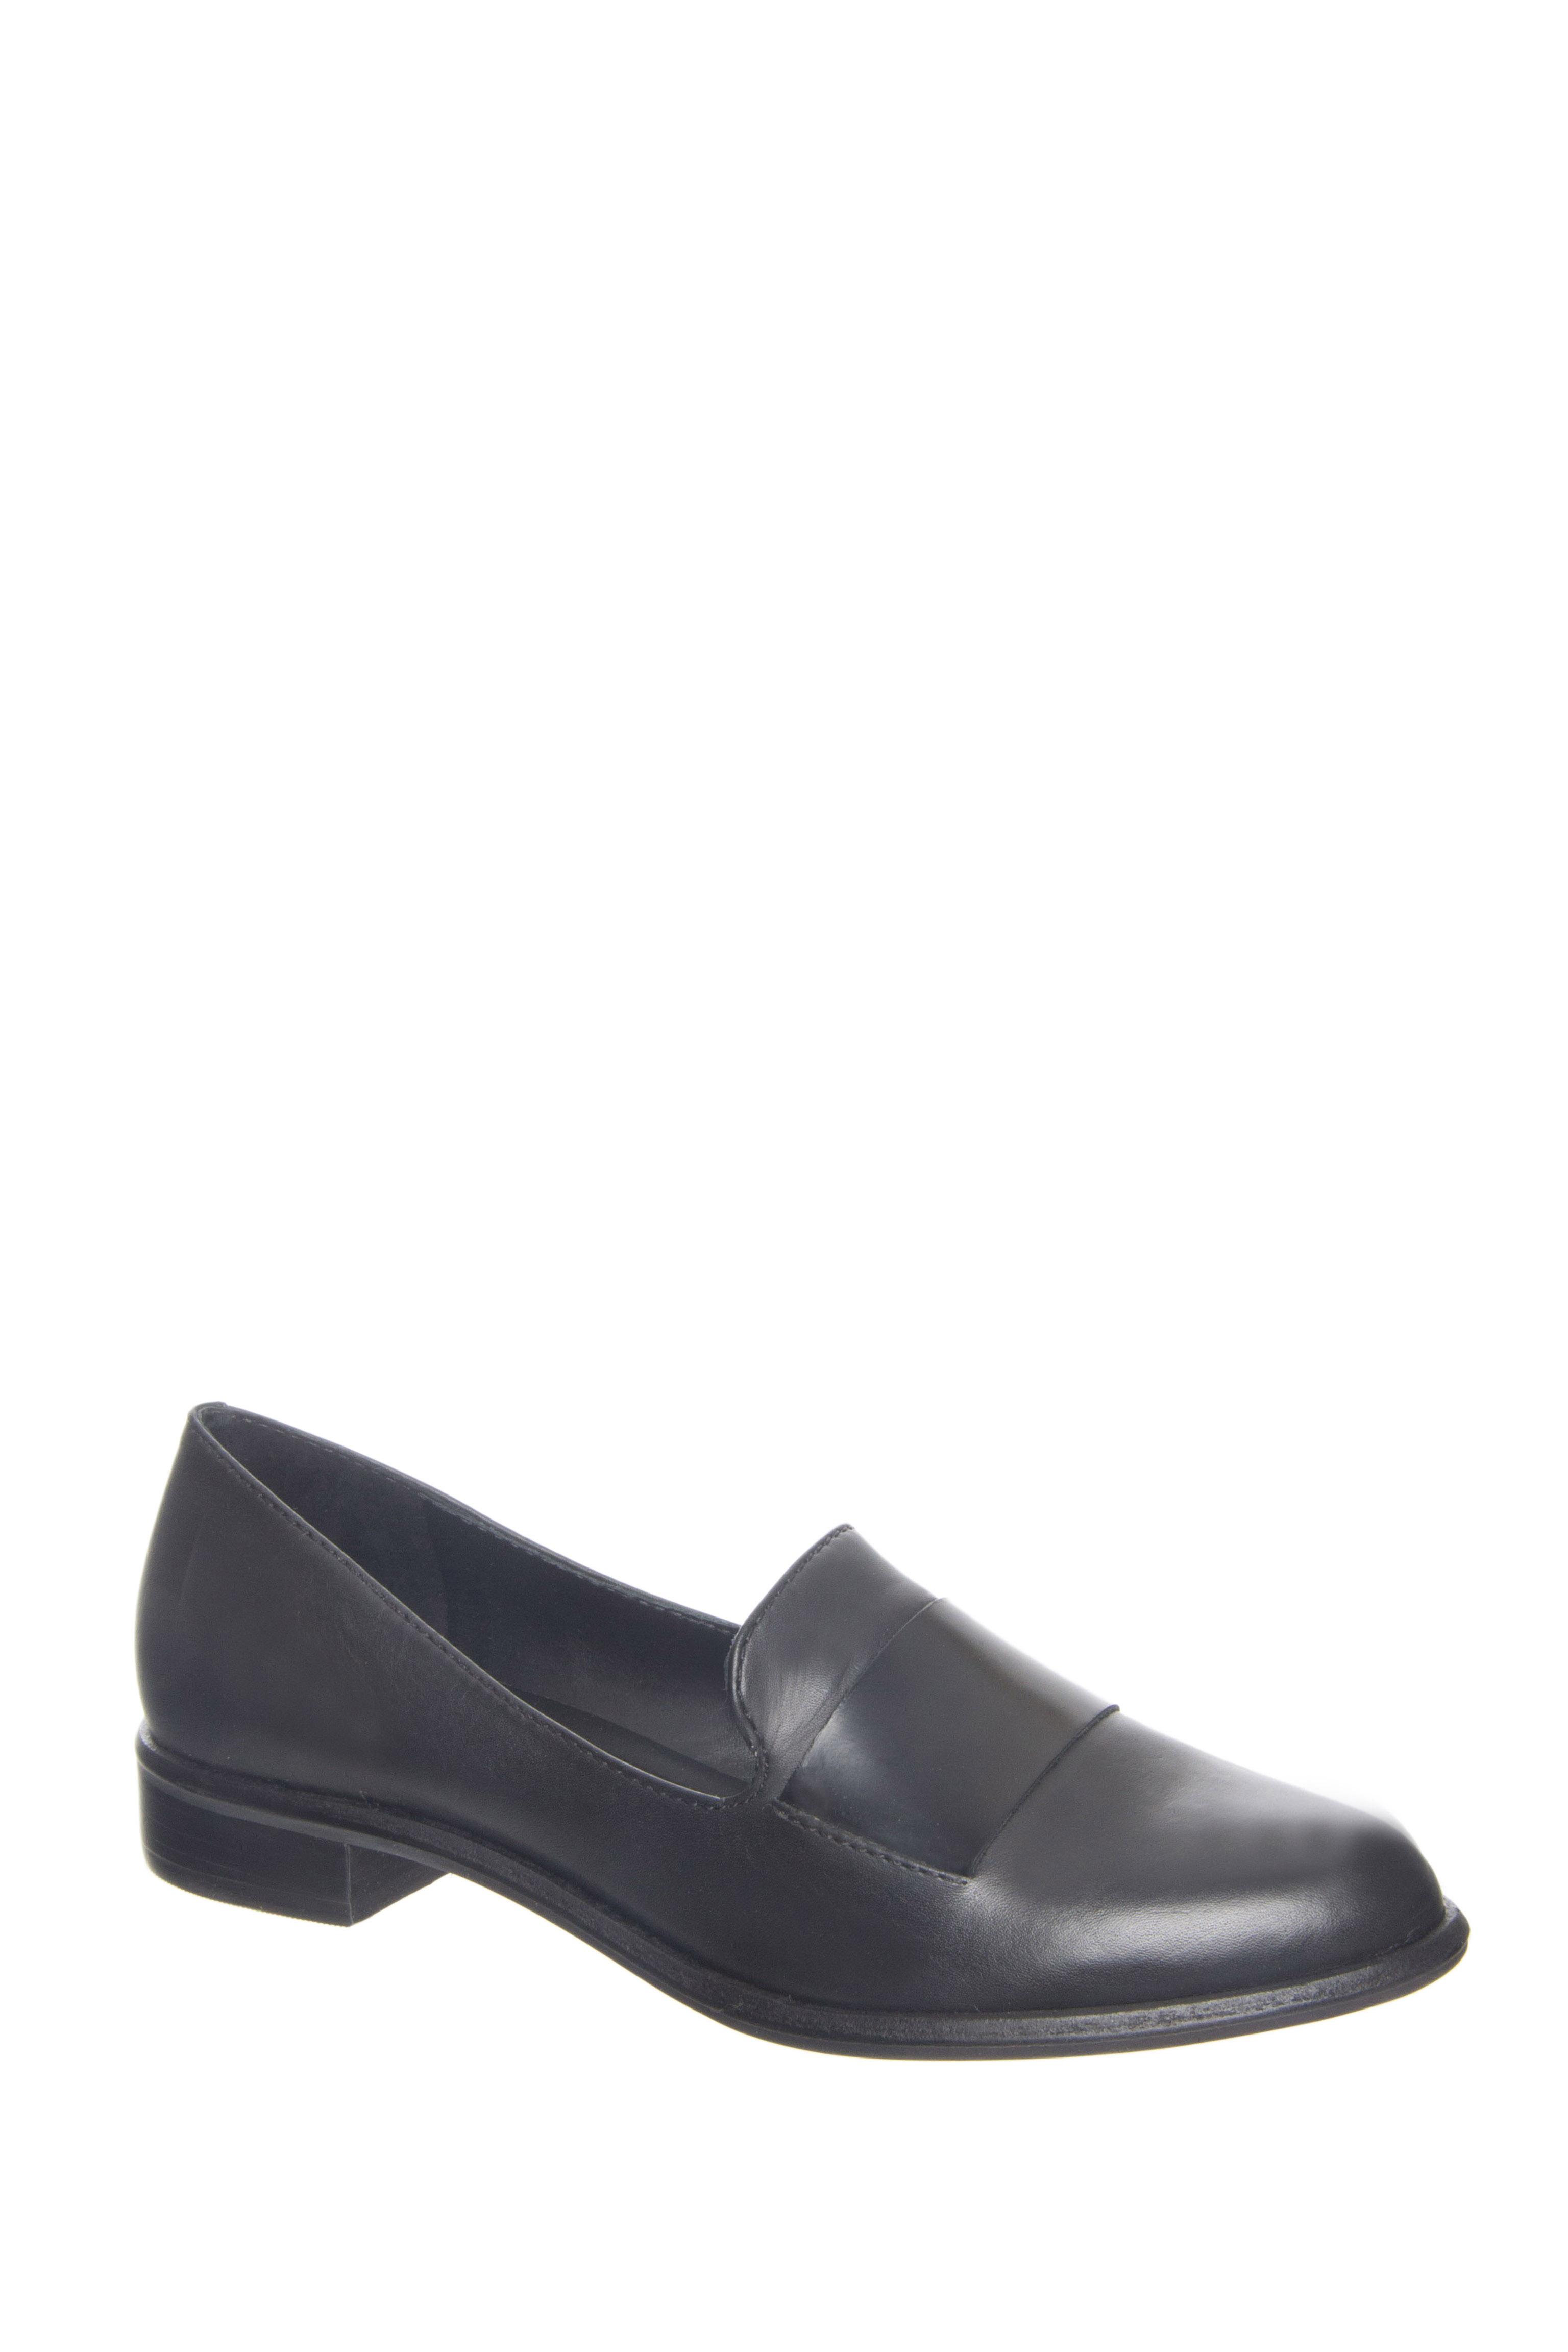 M4D3 Ocean Low Heel Loafers - Black